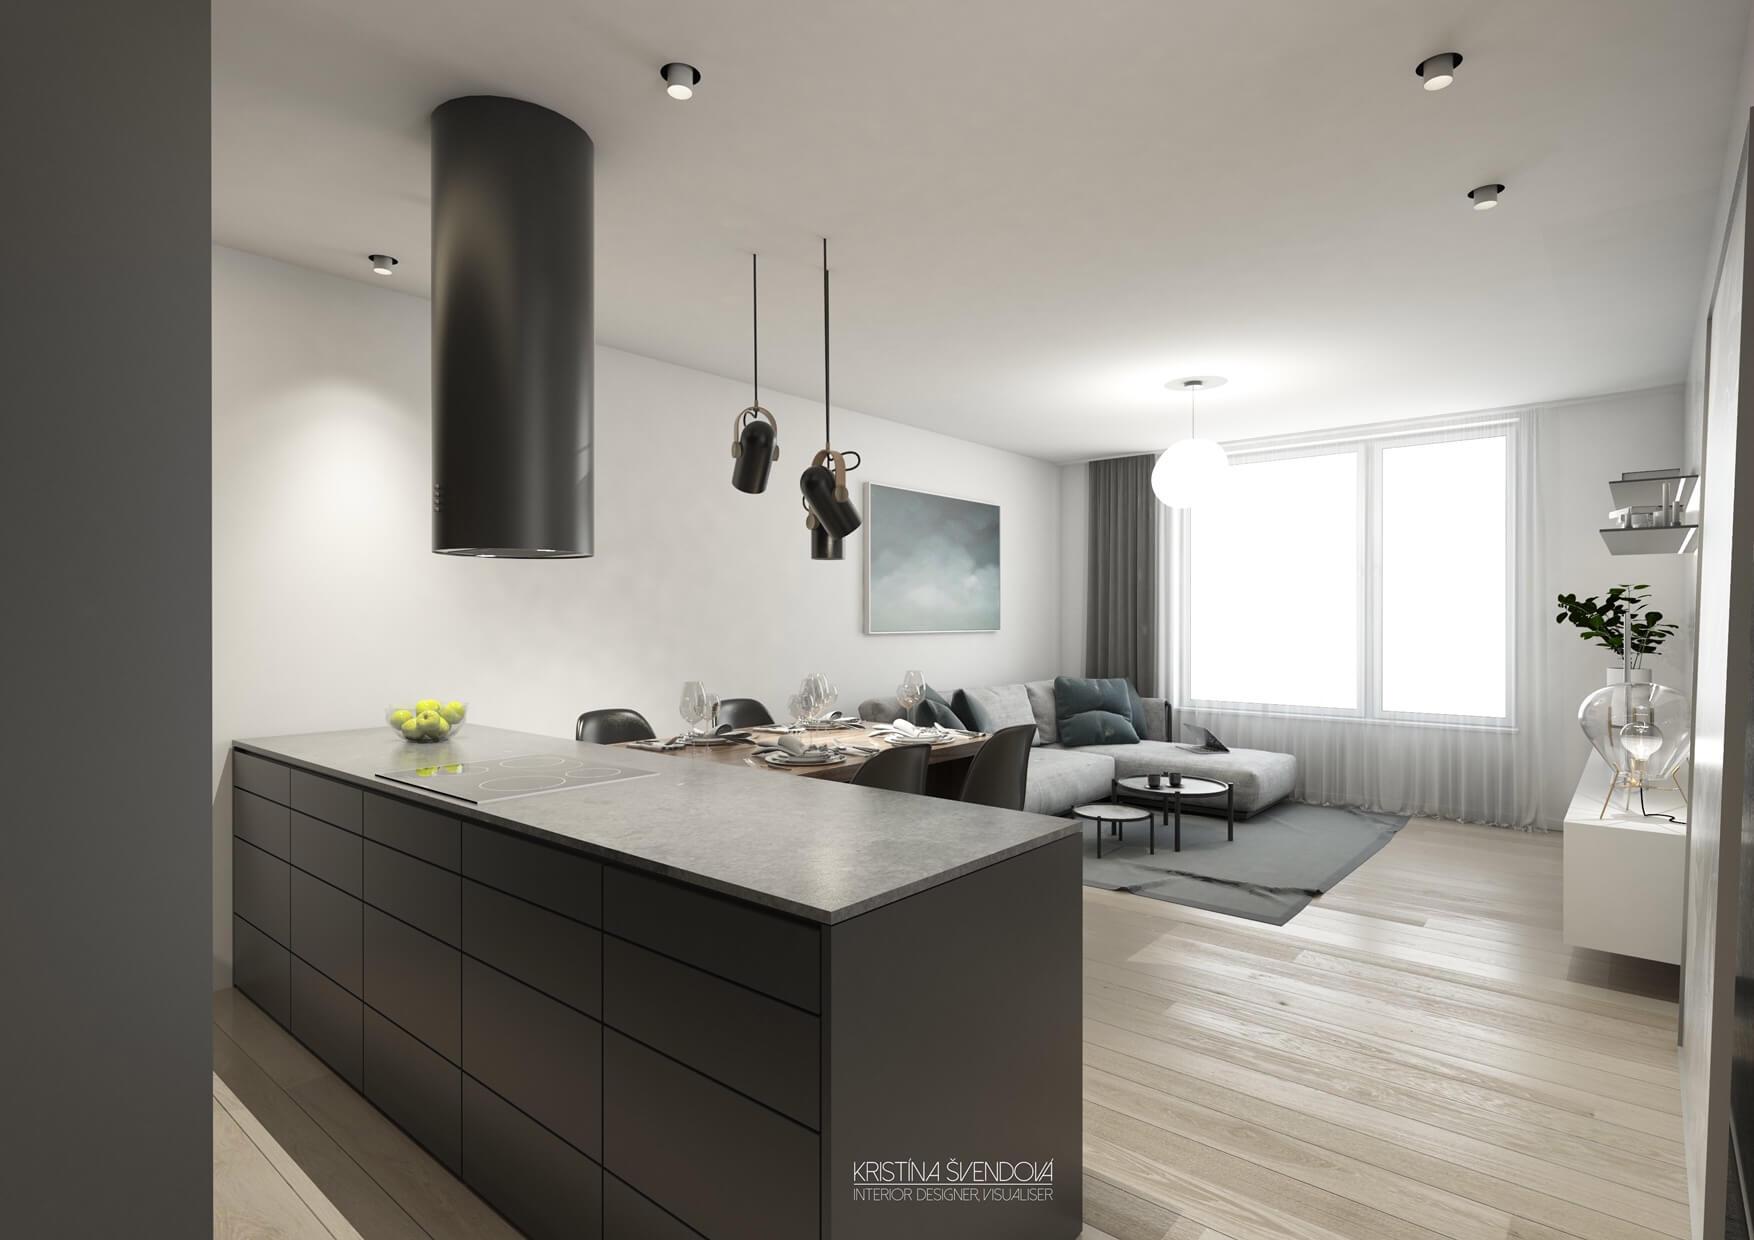 Predané: Exkluzívny 3- izbový byt v NOVOSTAVBE BA-NIVY, City Park, 71,24m2, balkón 8,5m2-3